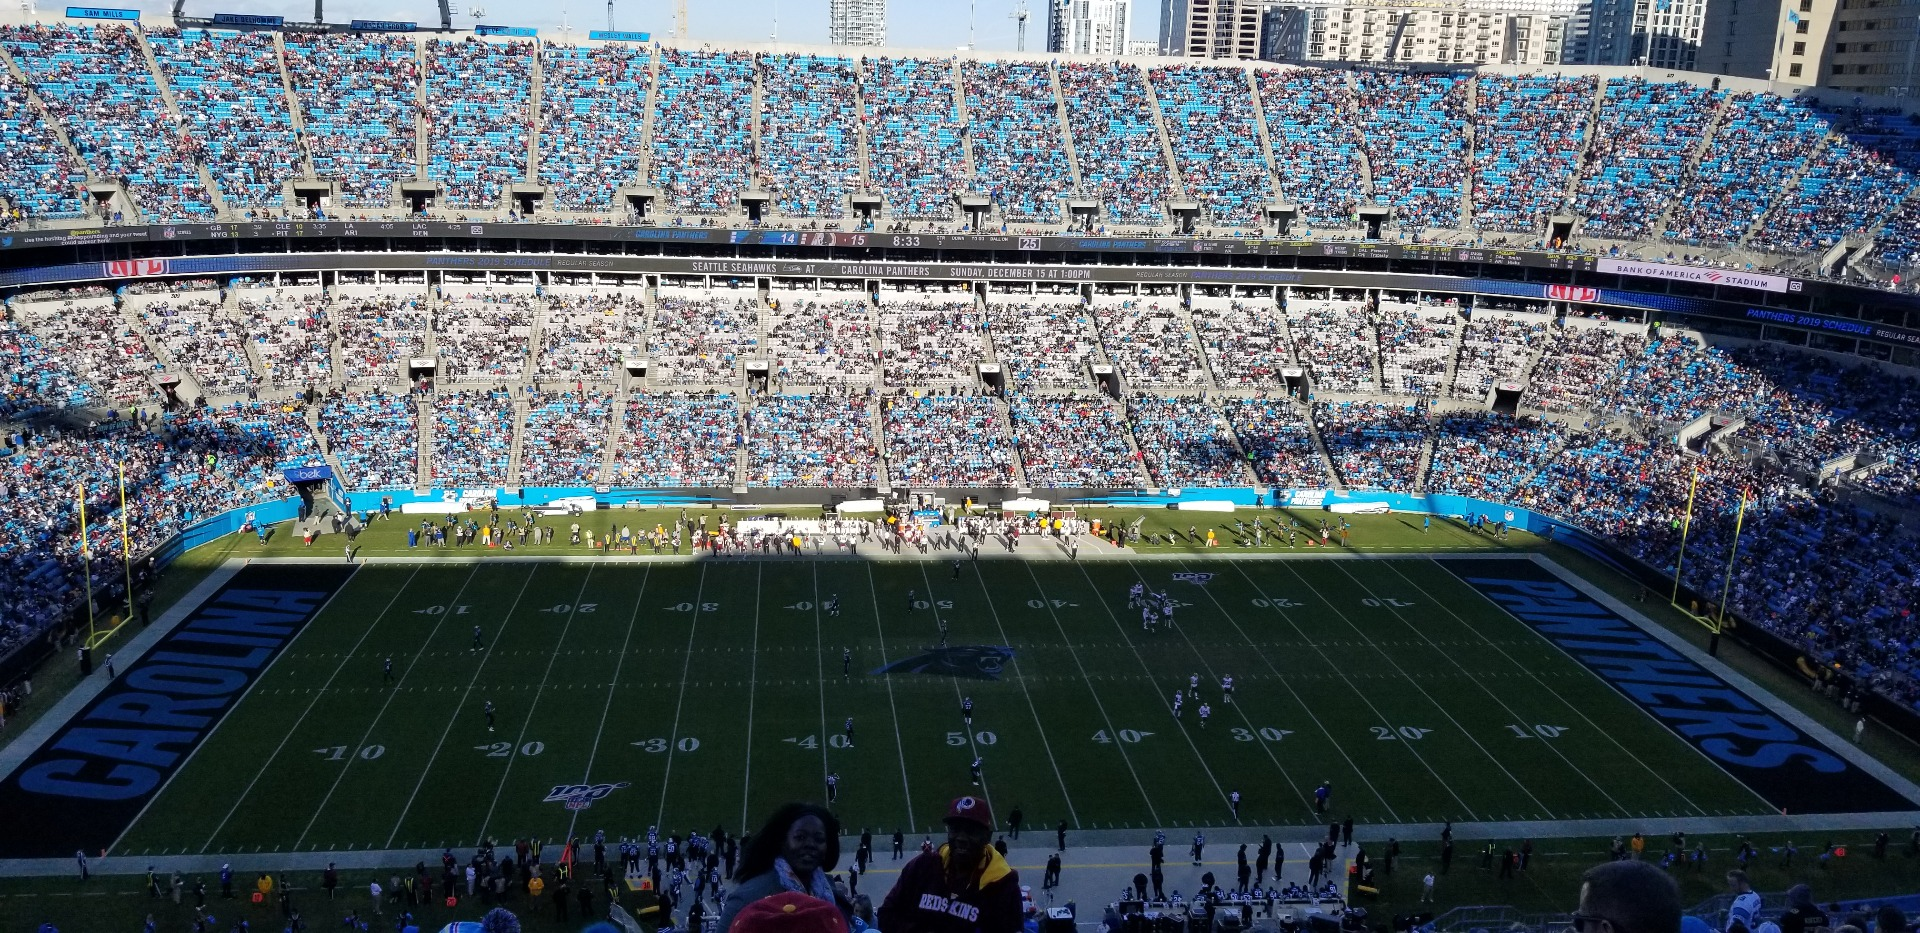 Bank of America Stadium Section 543 Row 22 Seat 1